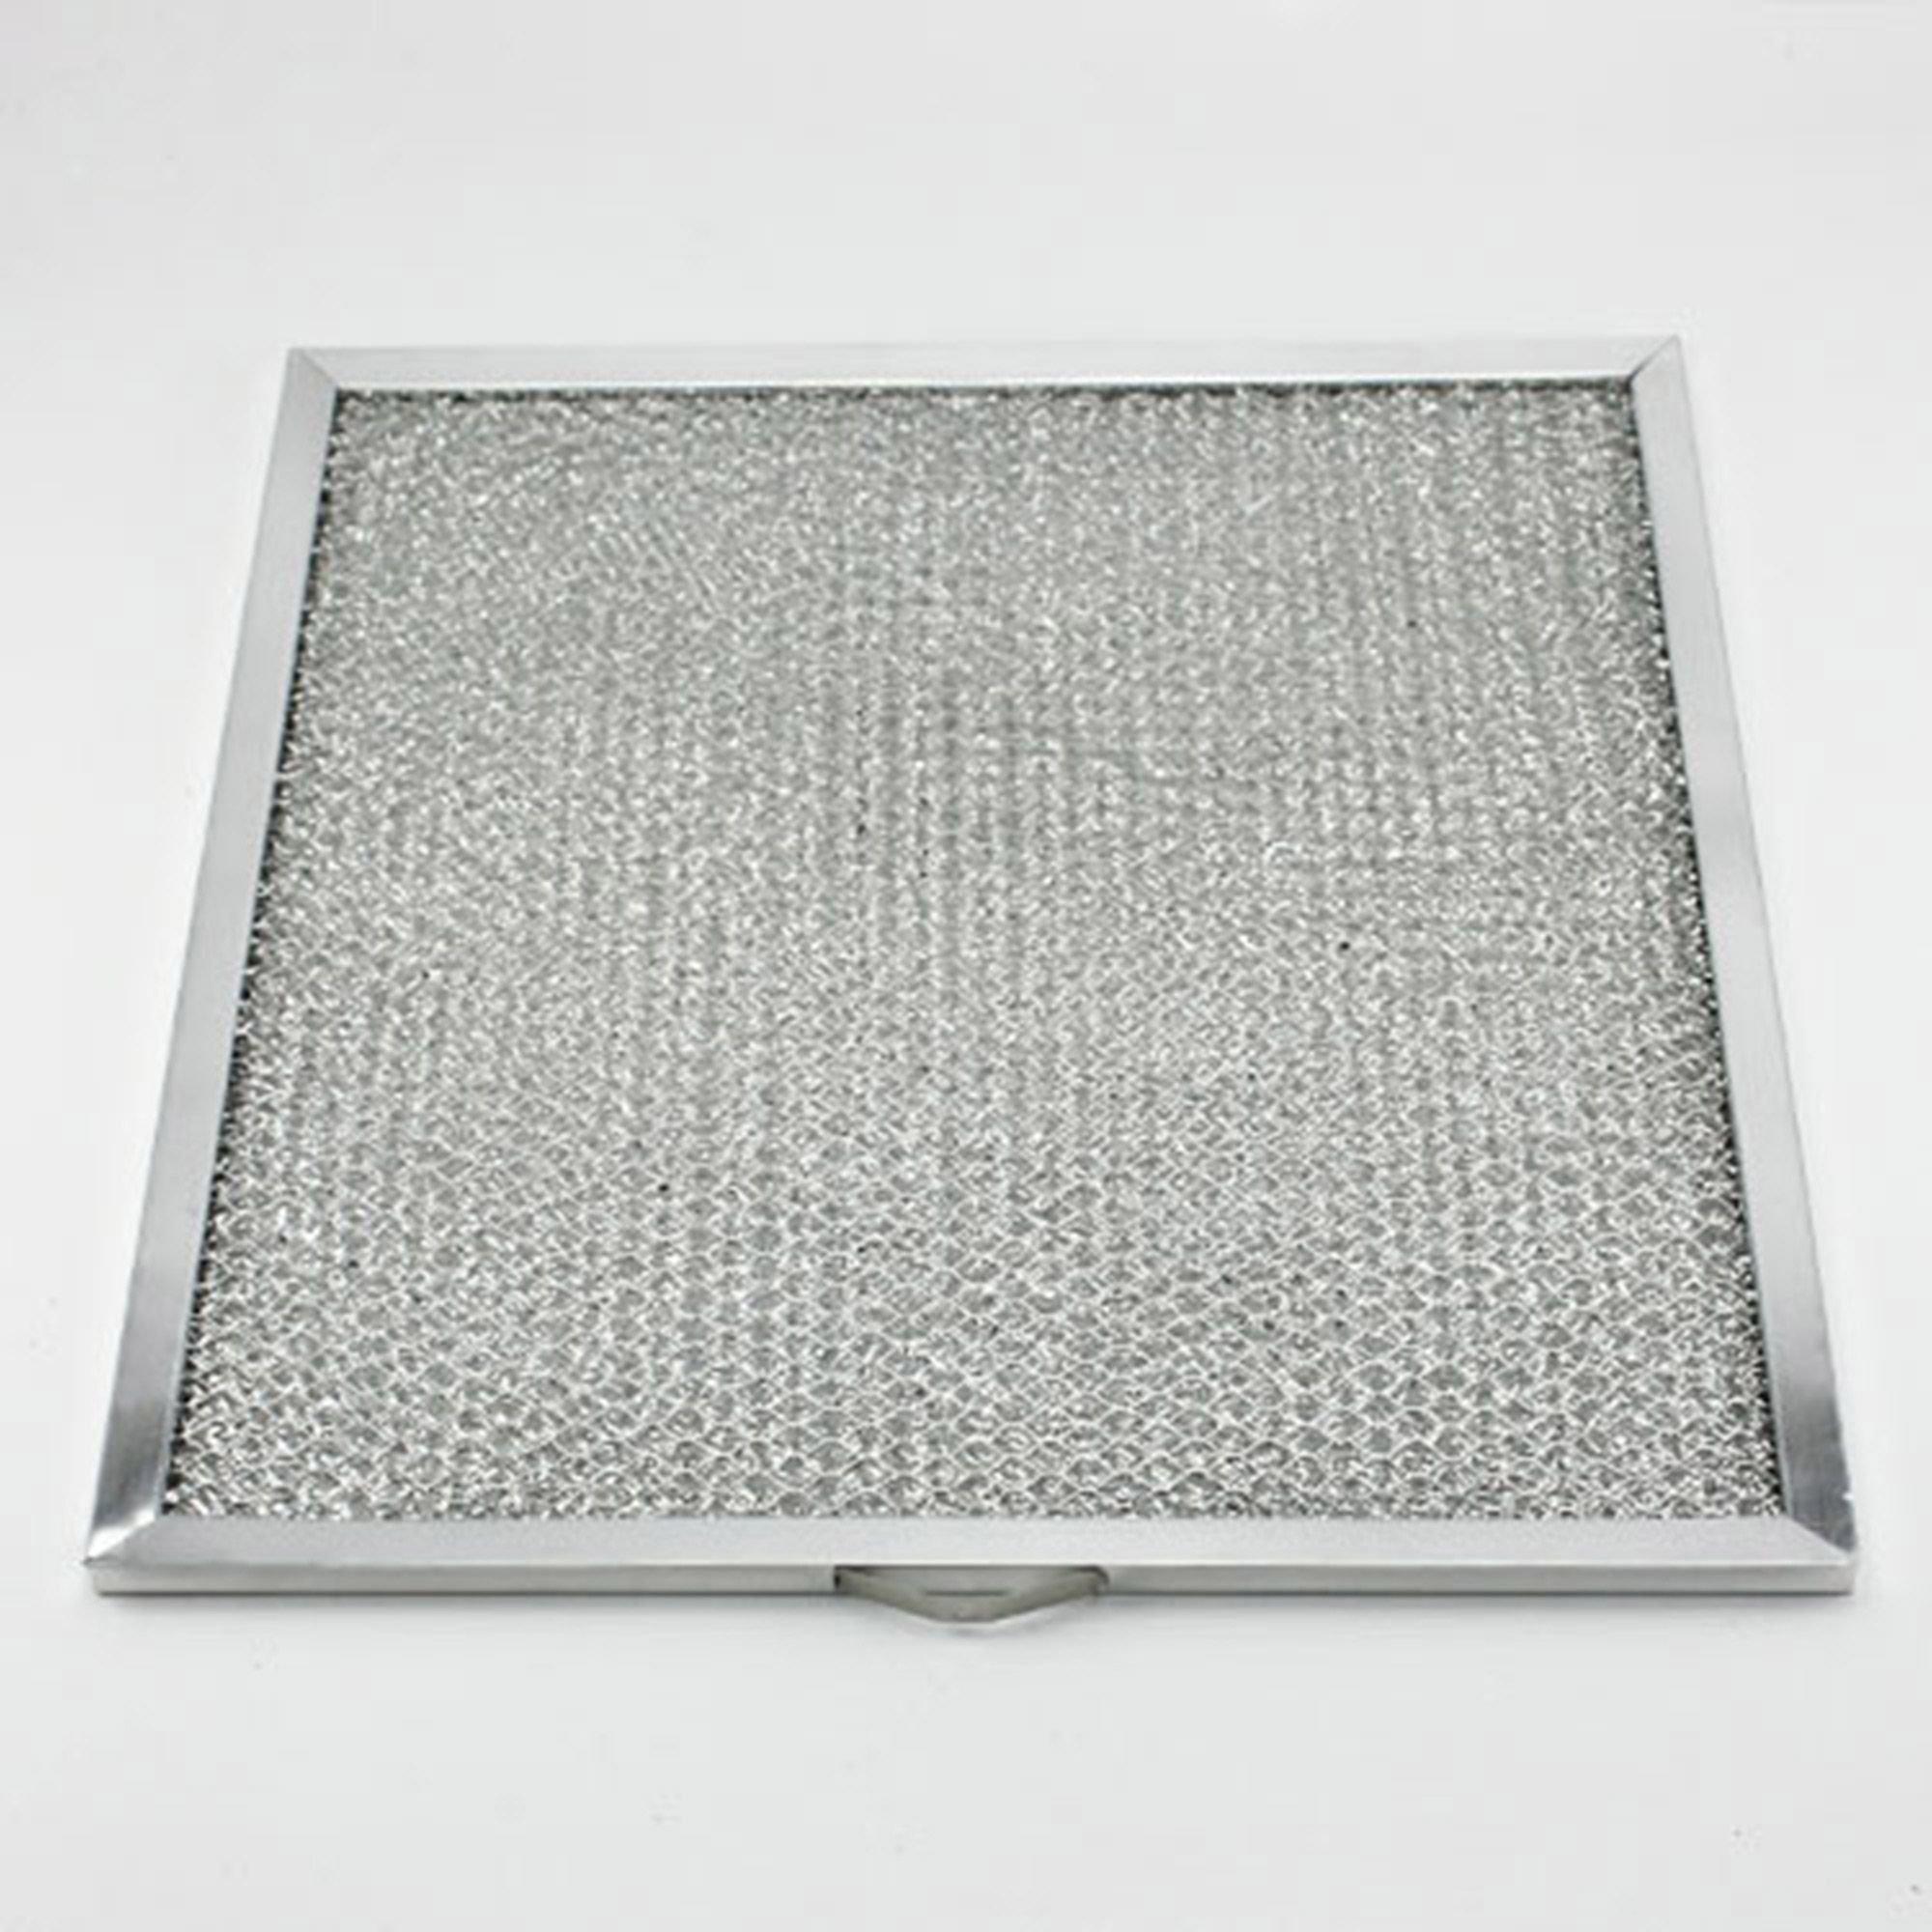 BROAN NUTONE RANGE HOOD FILTER 11 1/4 X 11 3/4 99010316 Model: